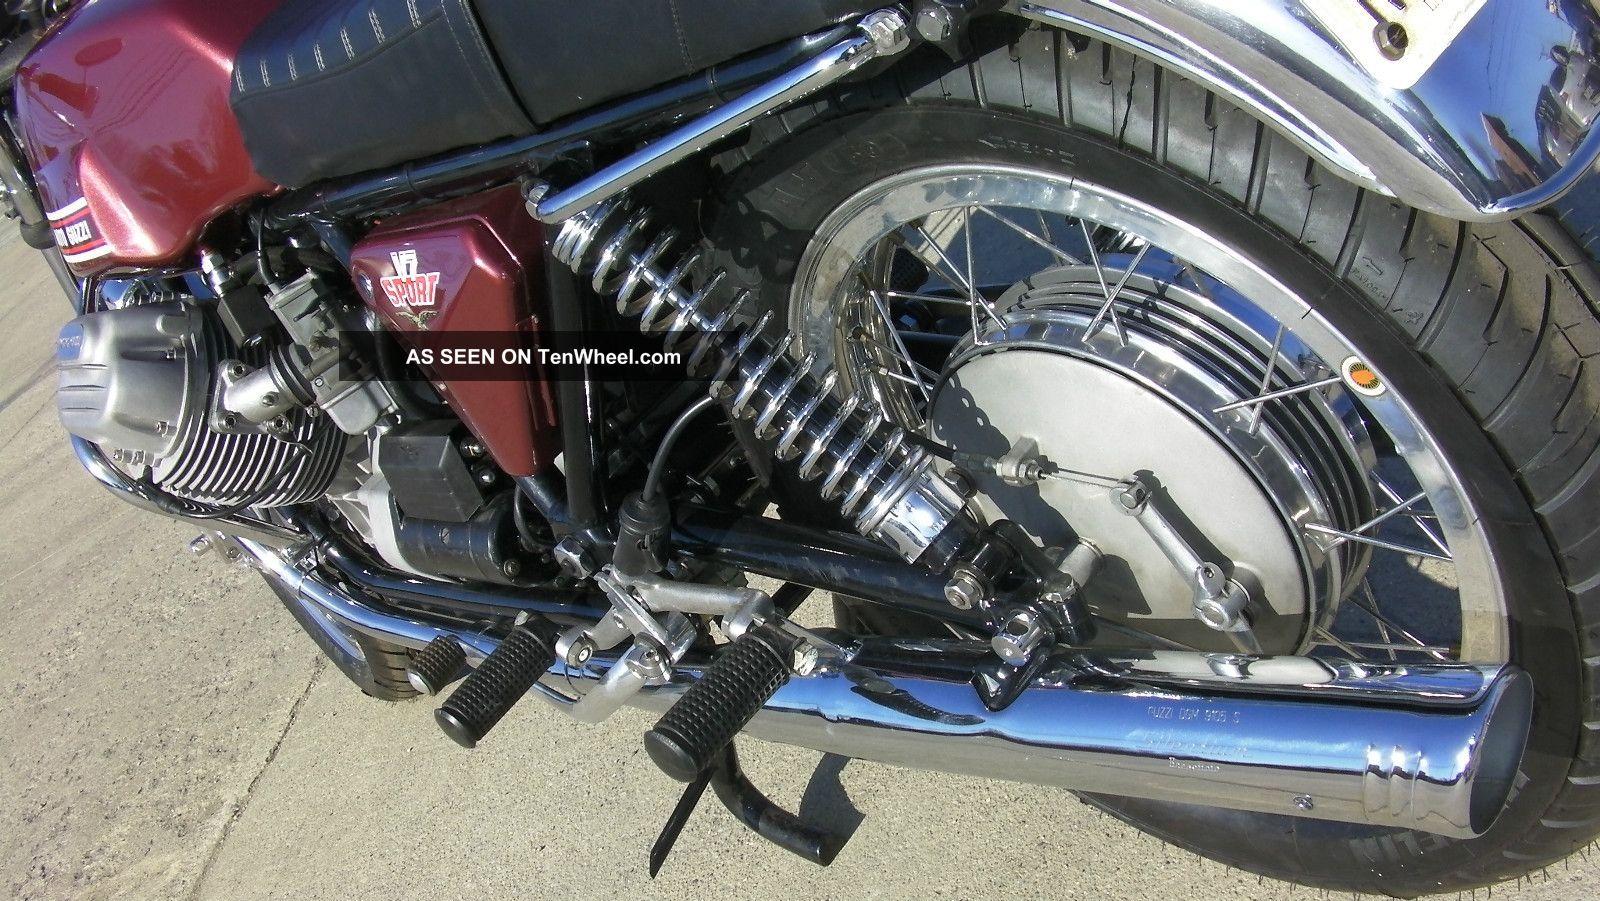 1973 moto guzzi v7 sport fresh restoration. Black Bedroom Furniture Sets. Home Design Ideas